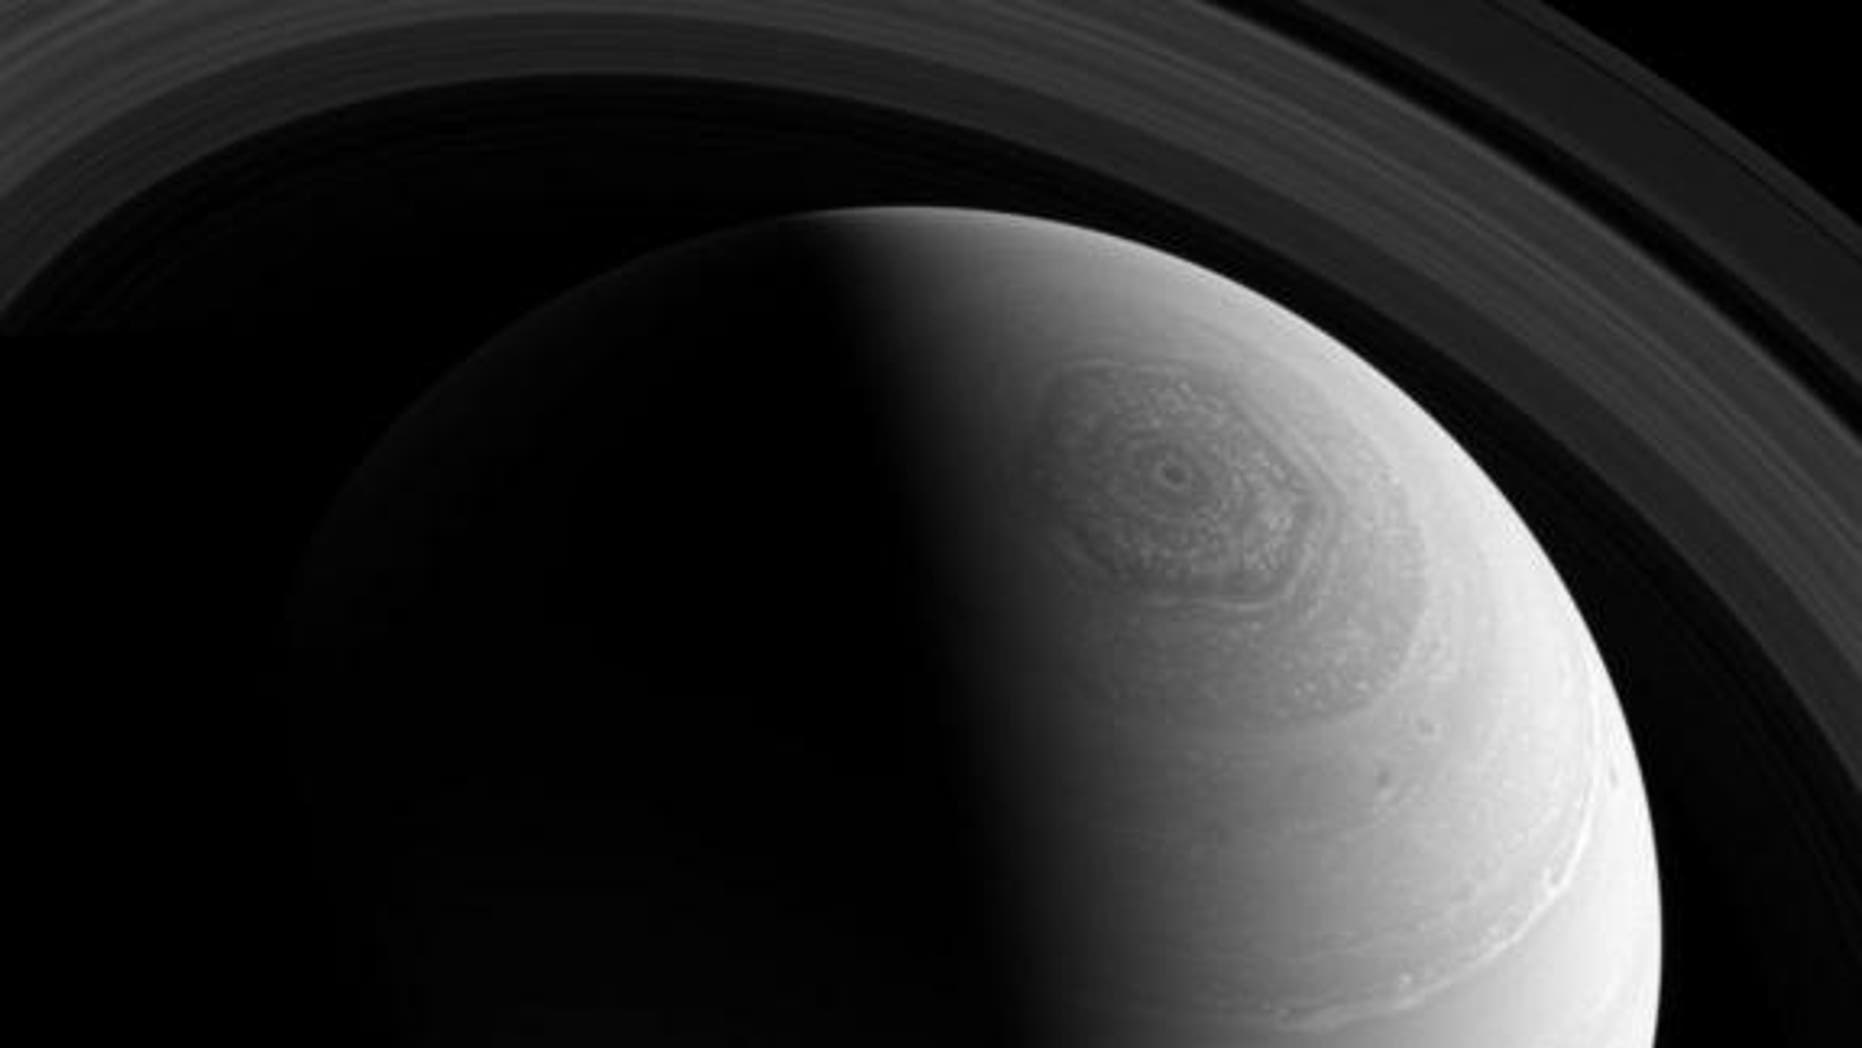 Saturn's odd hexagonal jet stream swirls in this amazing photo taken by the Cassini spacecraft. Image released Feb. 3, 2014.